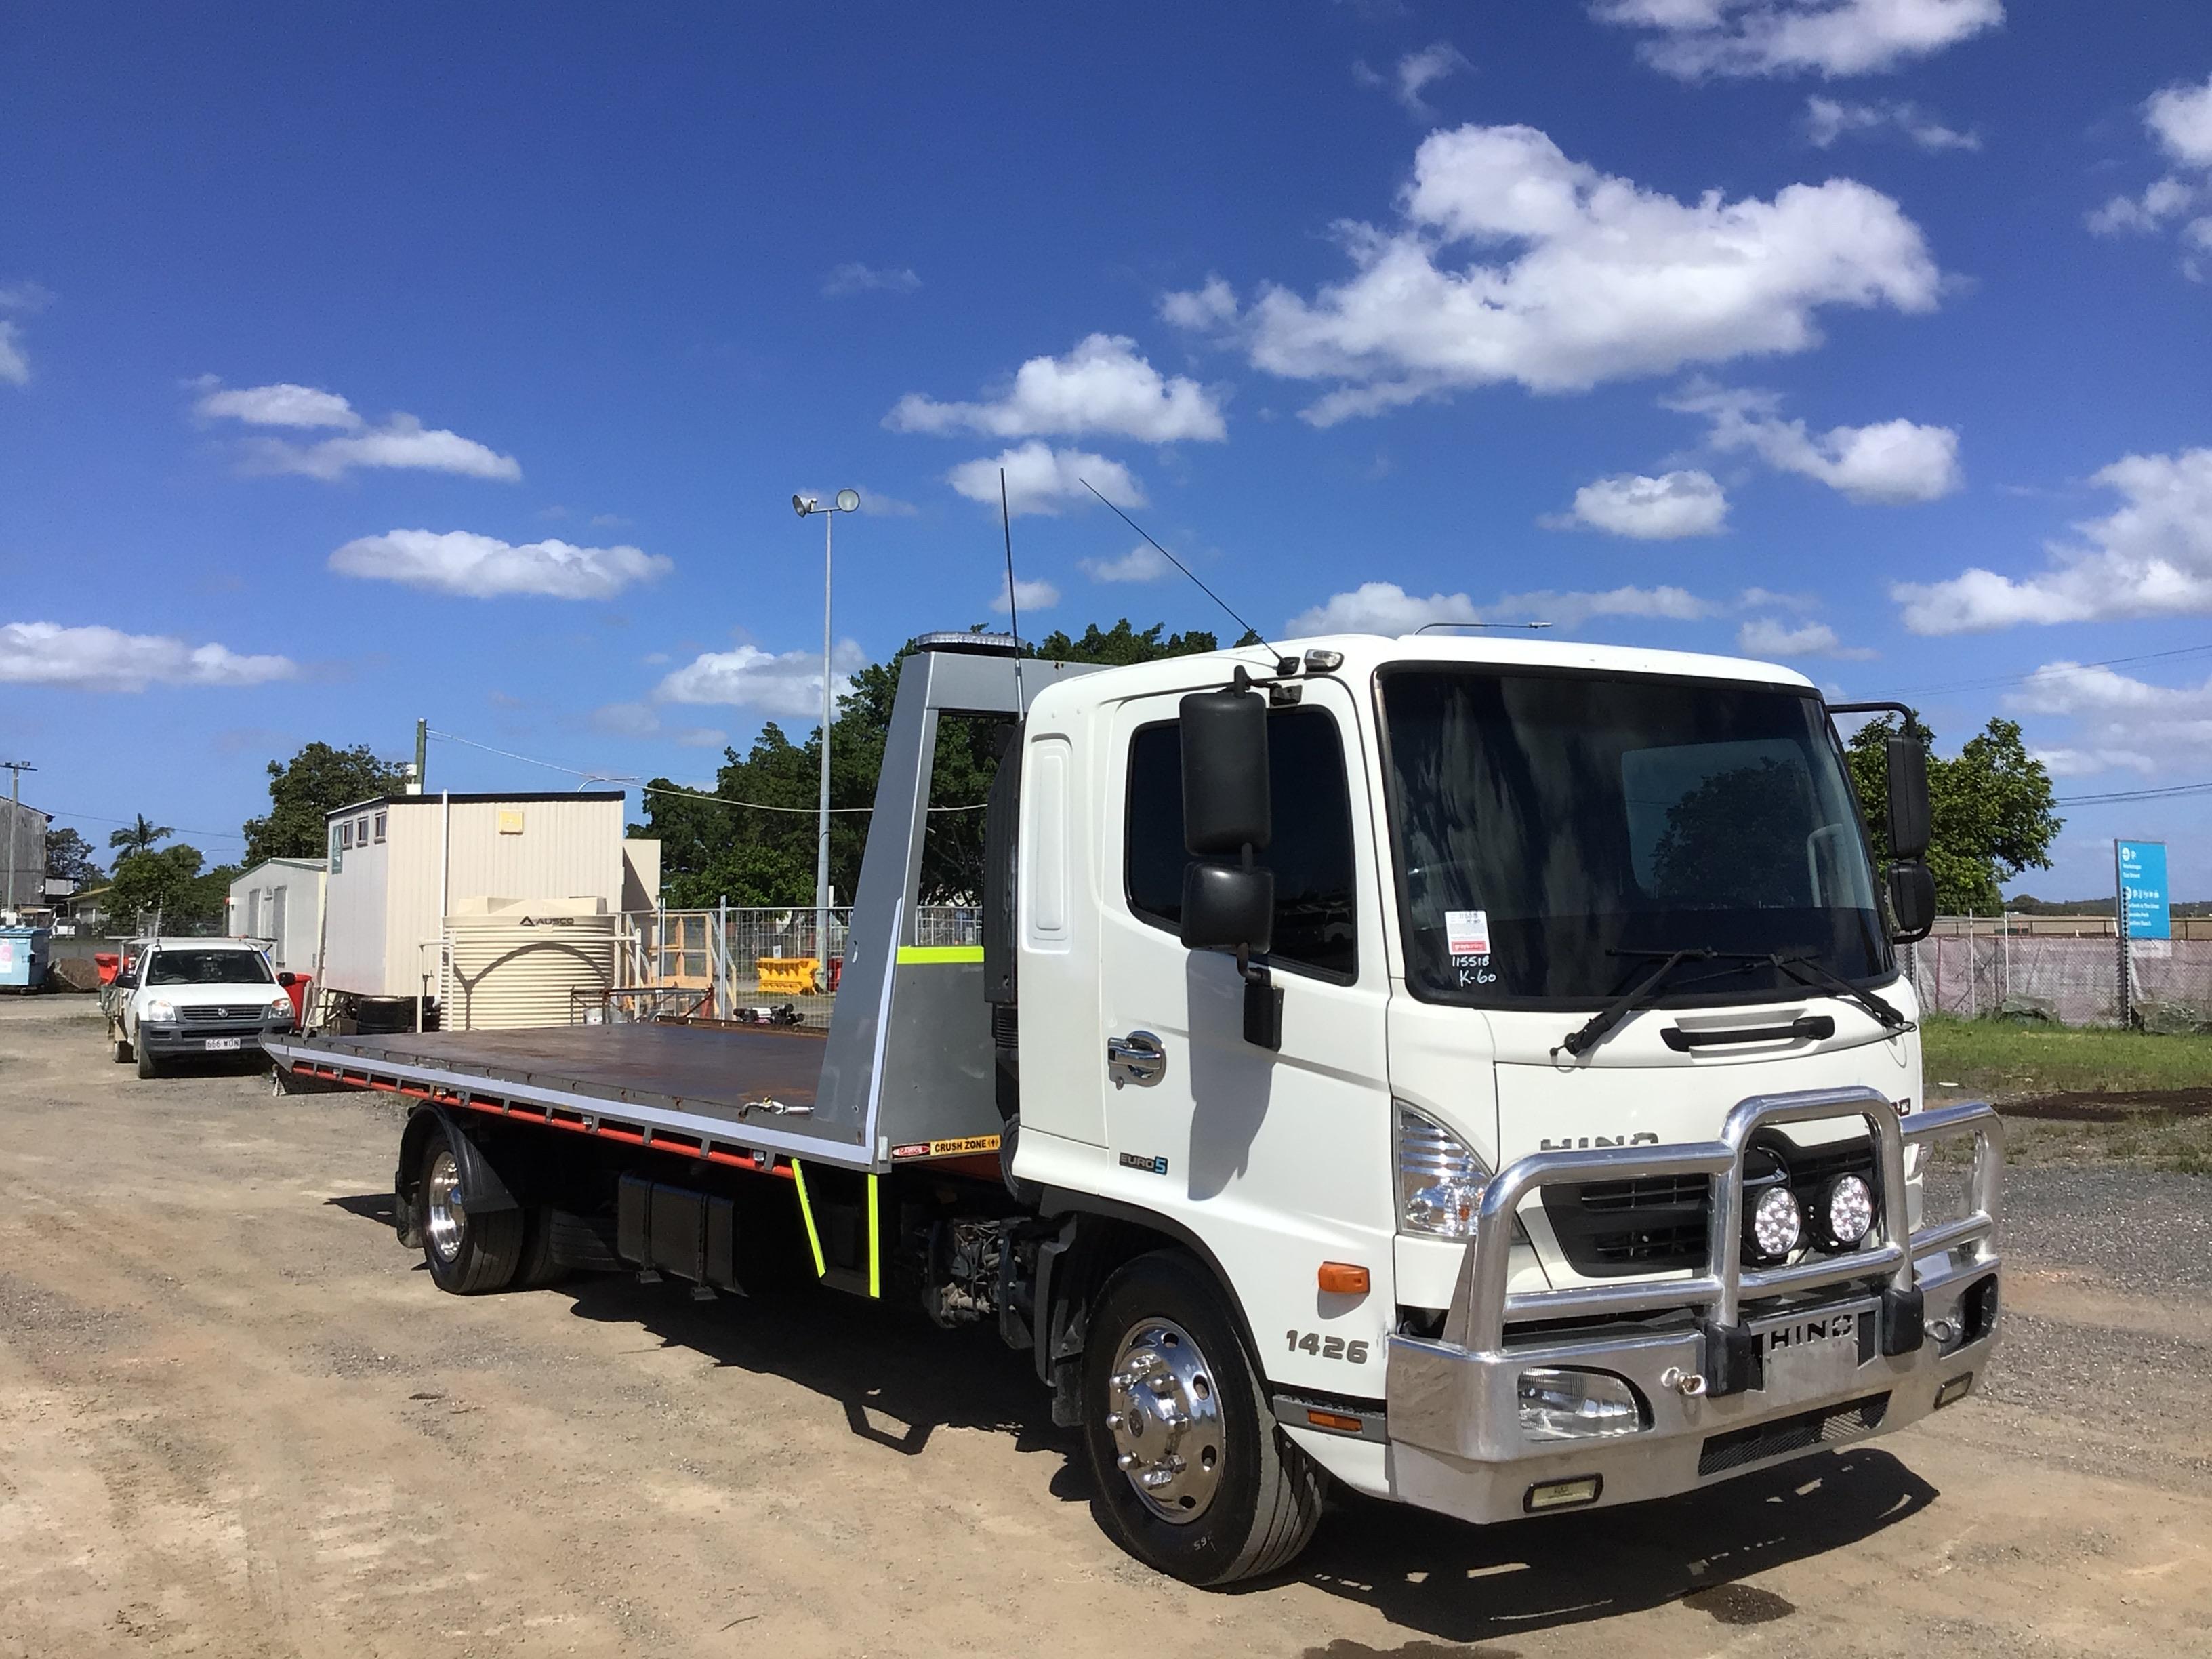 2011 Hino FE 4 x 2 Tilt Tray Truck with Winch